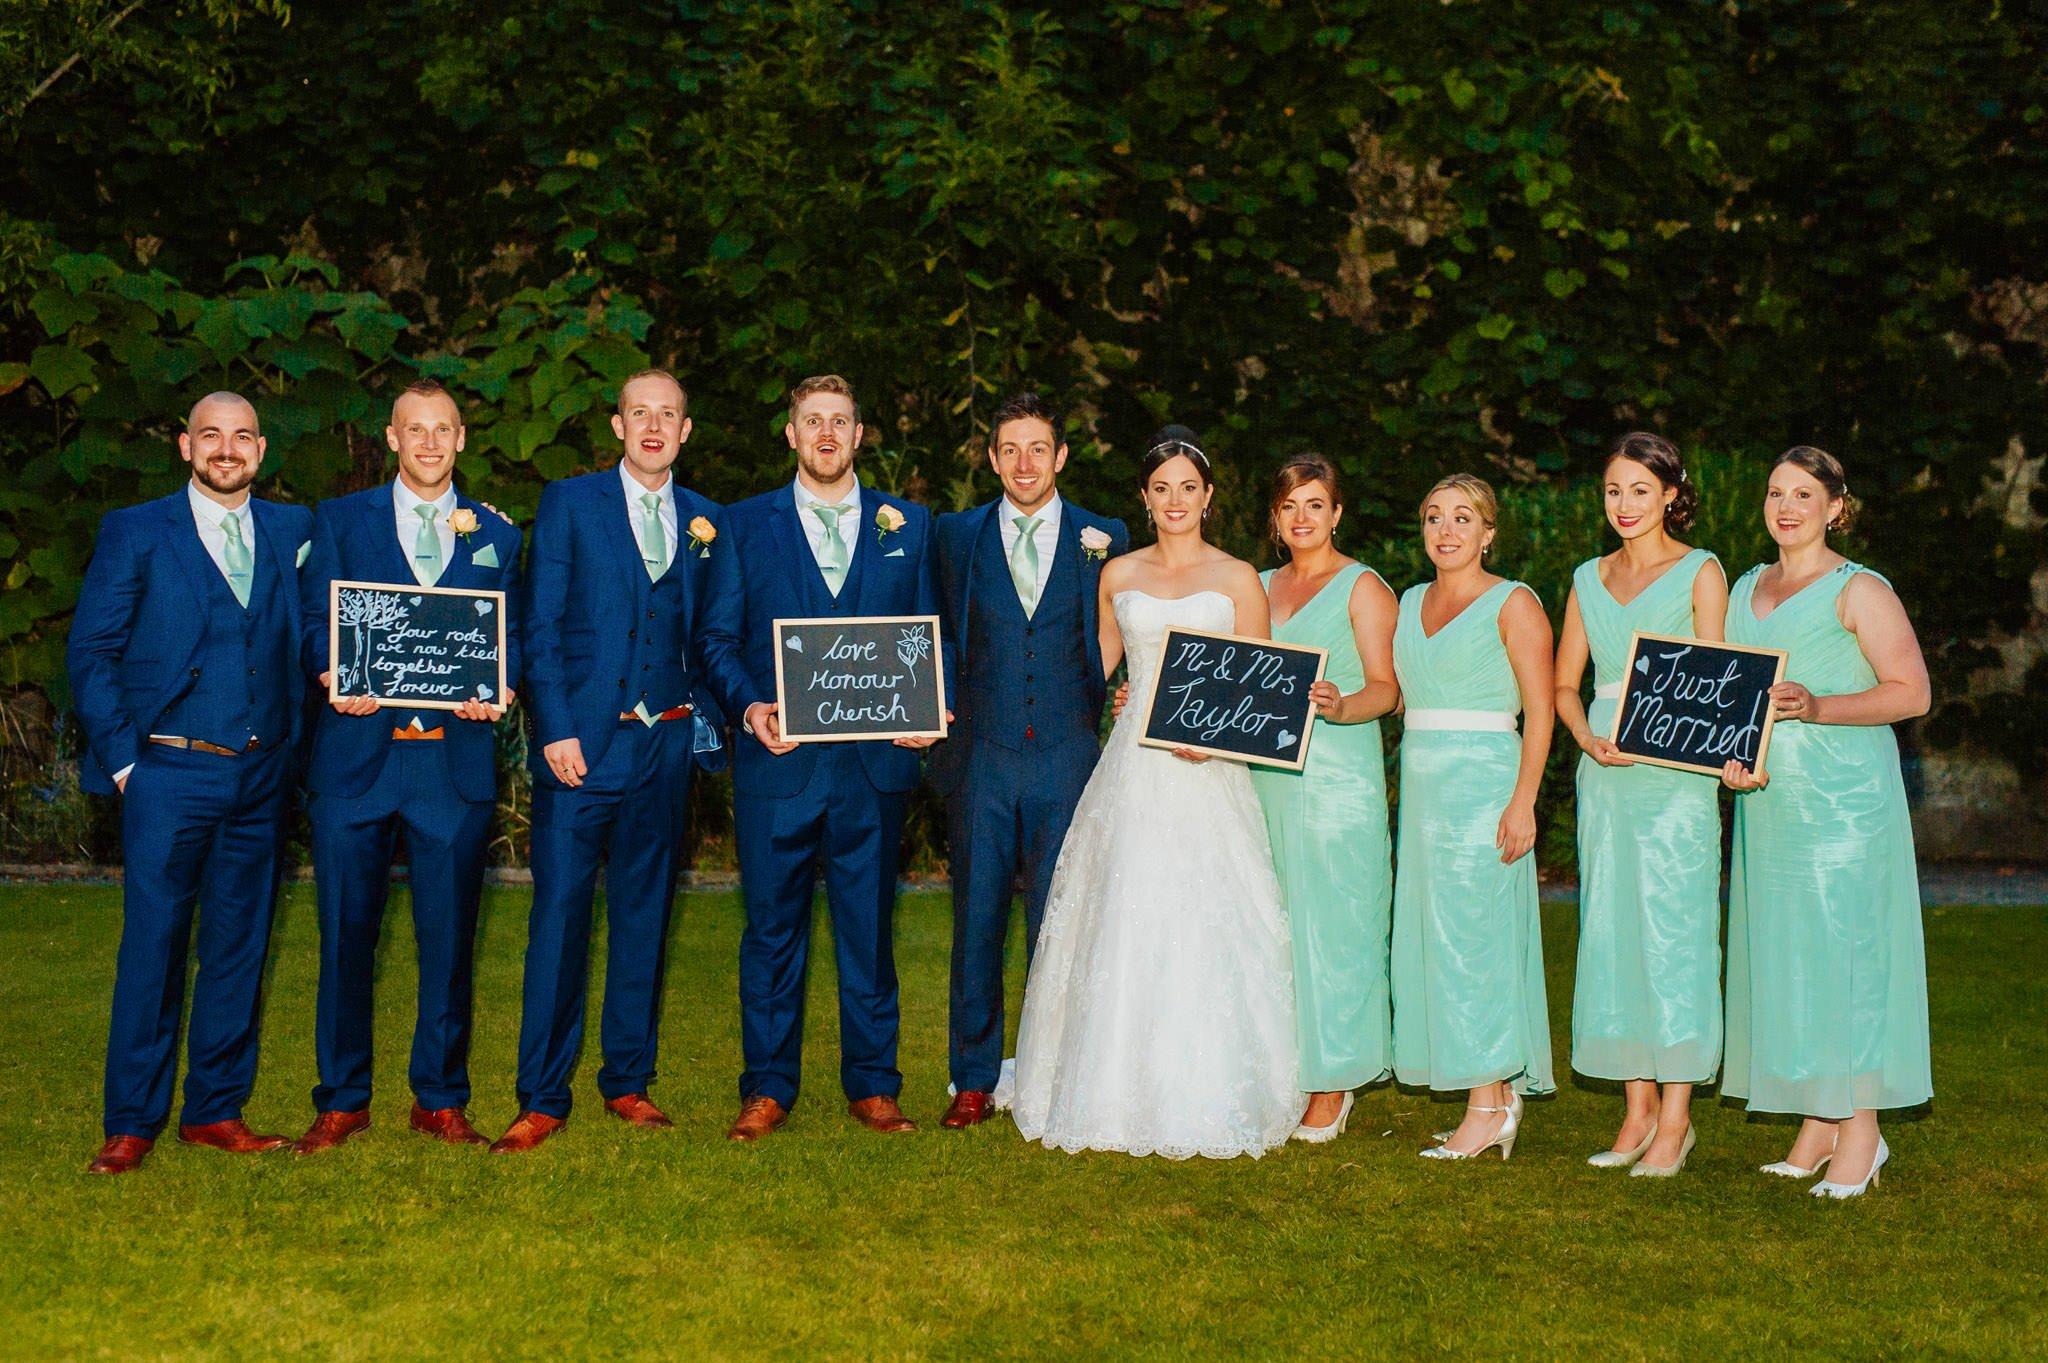 Eastnor Castle wedding photographer Herefordshire, West Midlands - Sarah + Dean 65